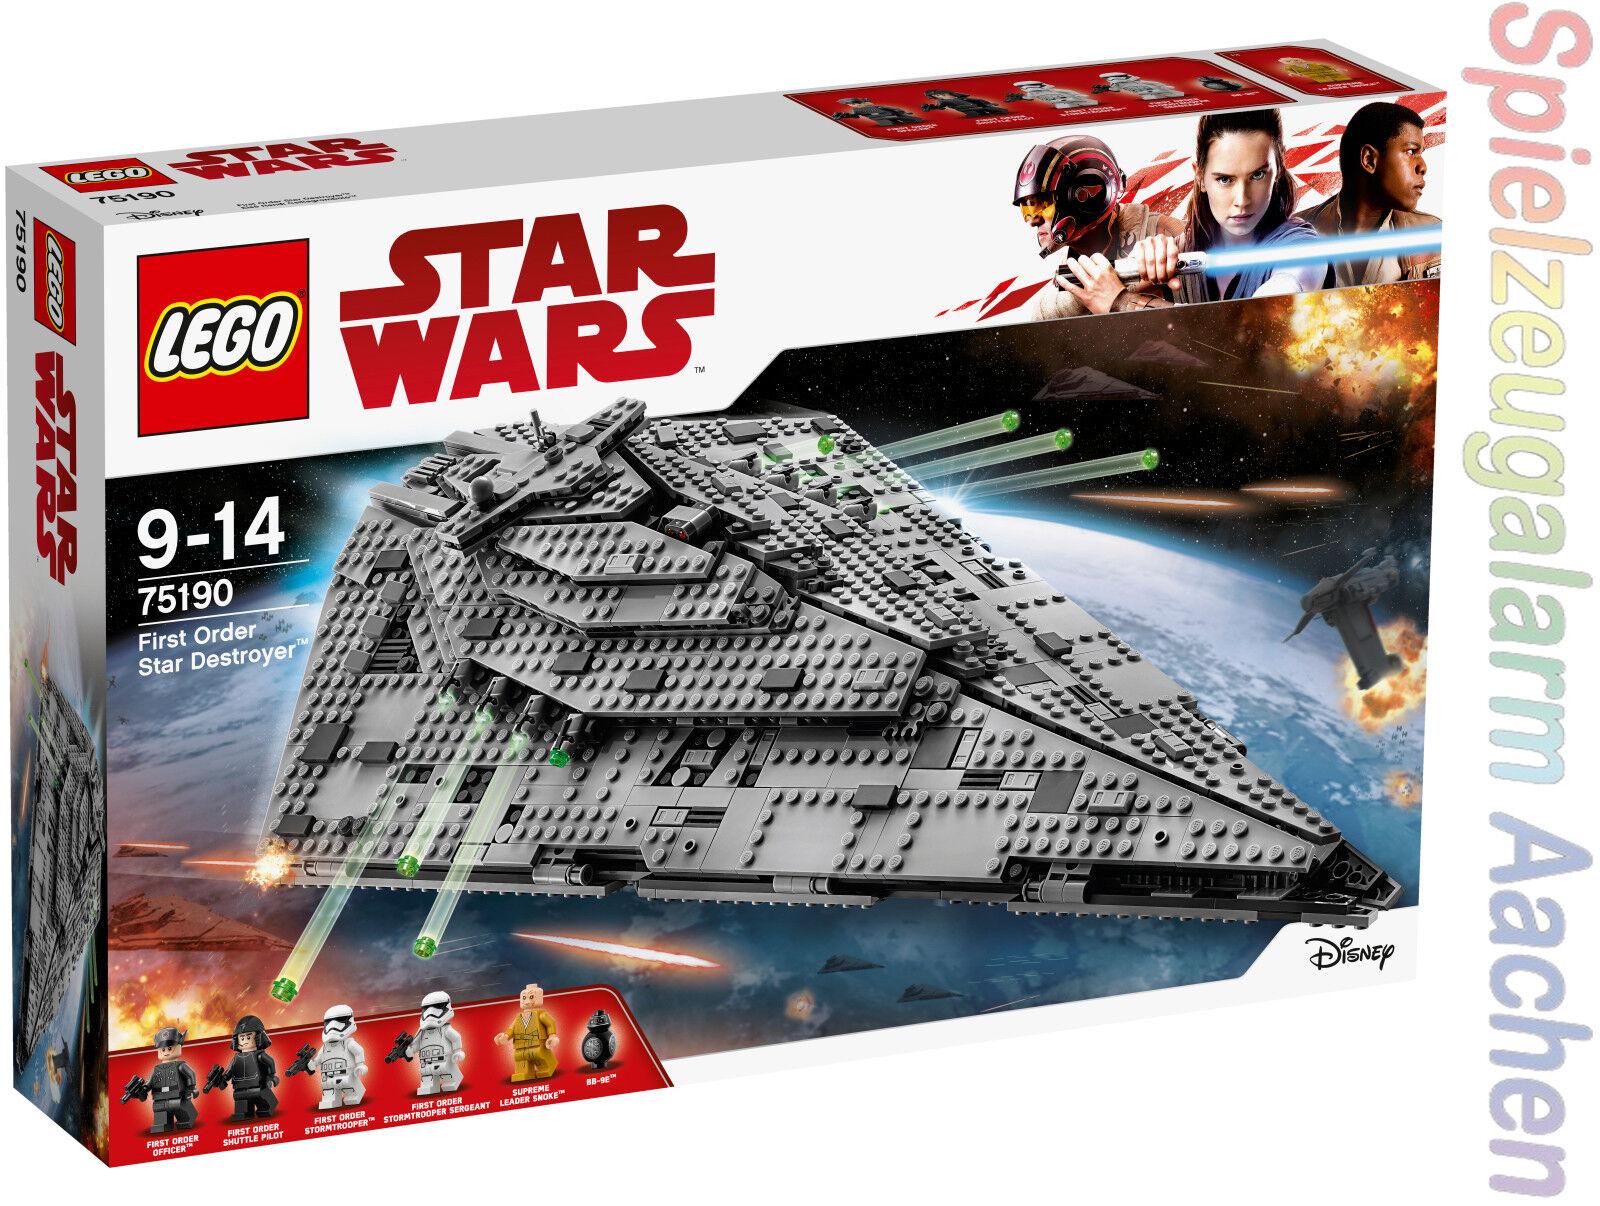 LEGO ® Star Wars 75190 75190 75190 First Order Star Destroyer ™ d1d6bb